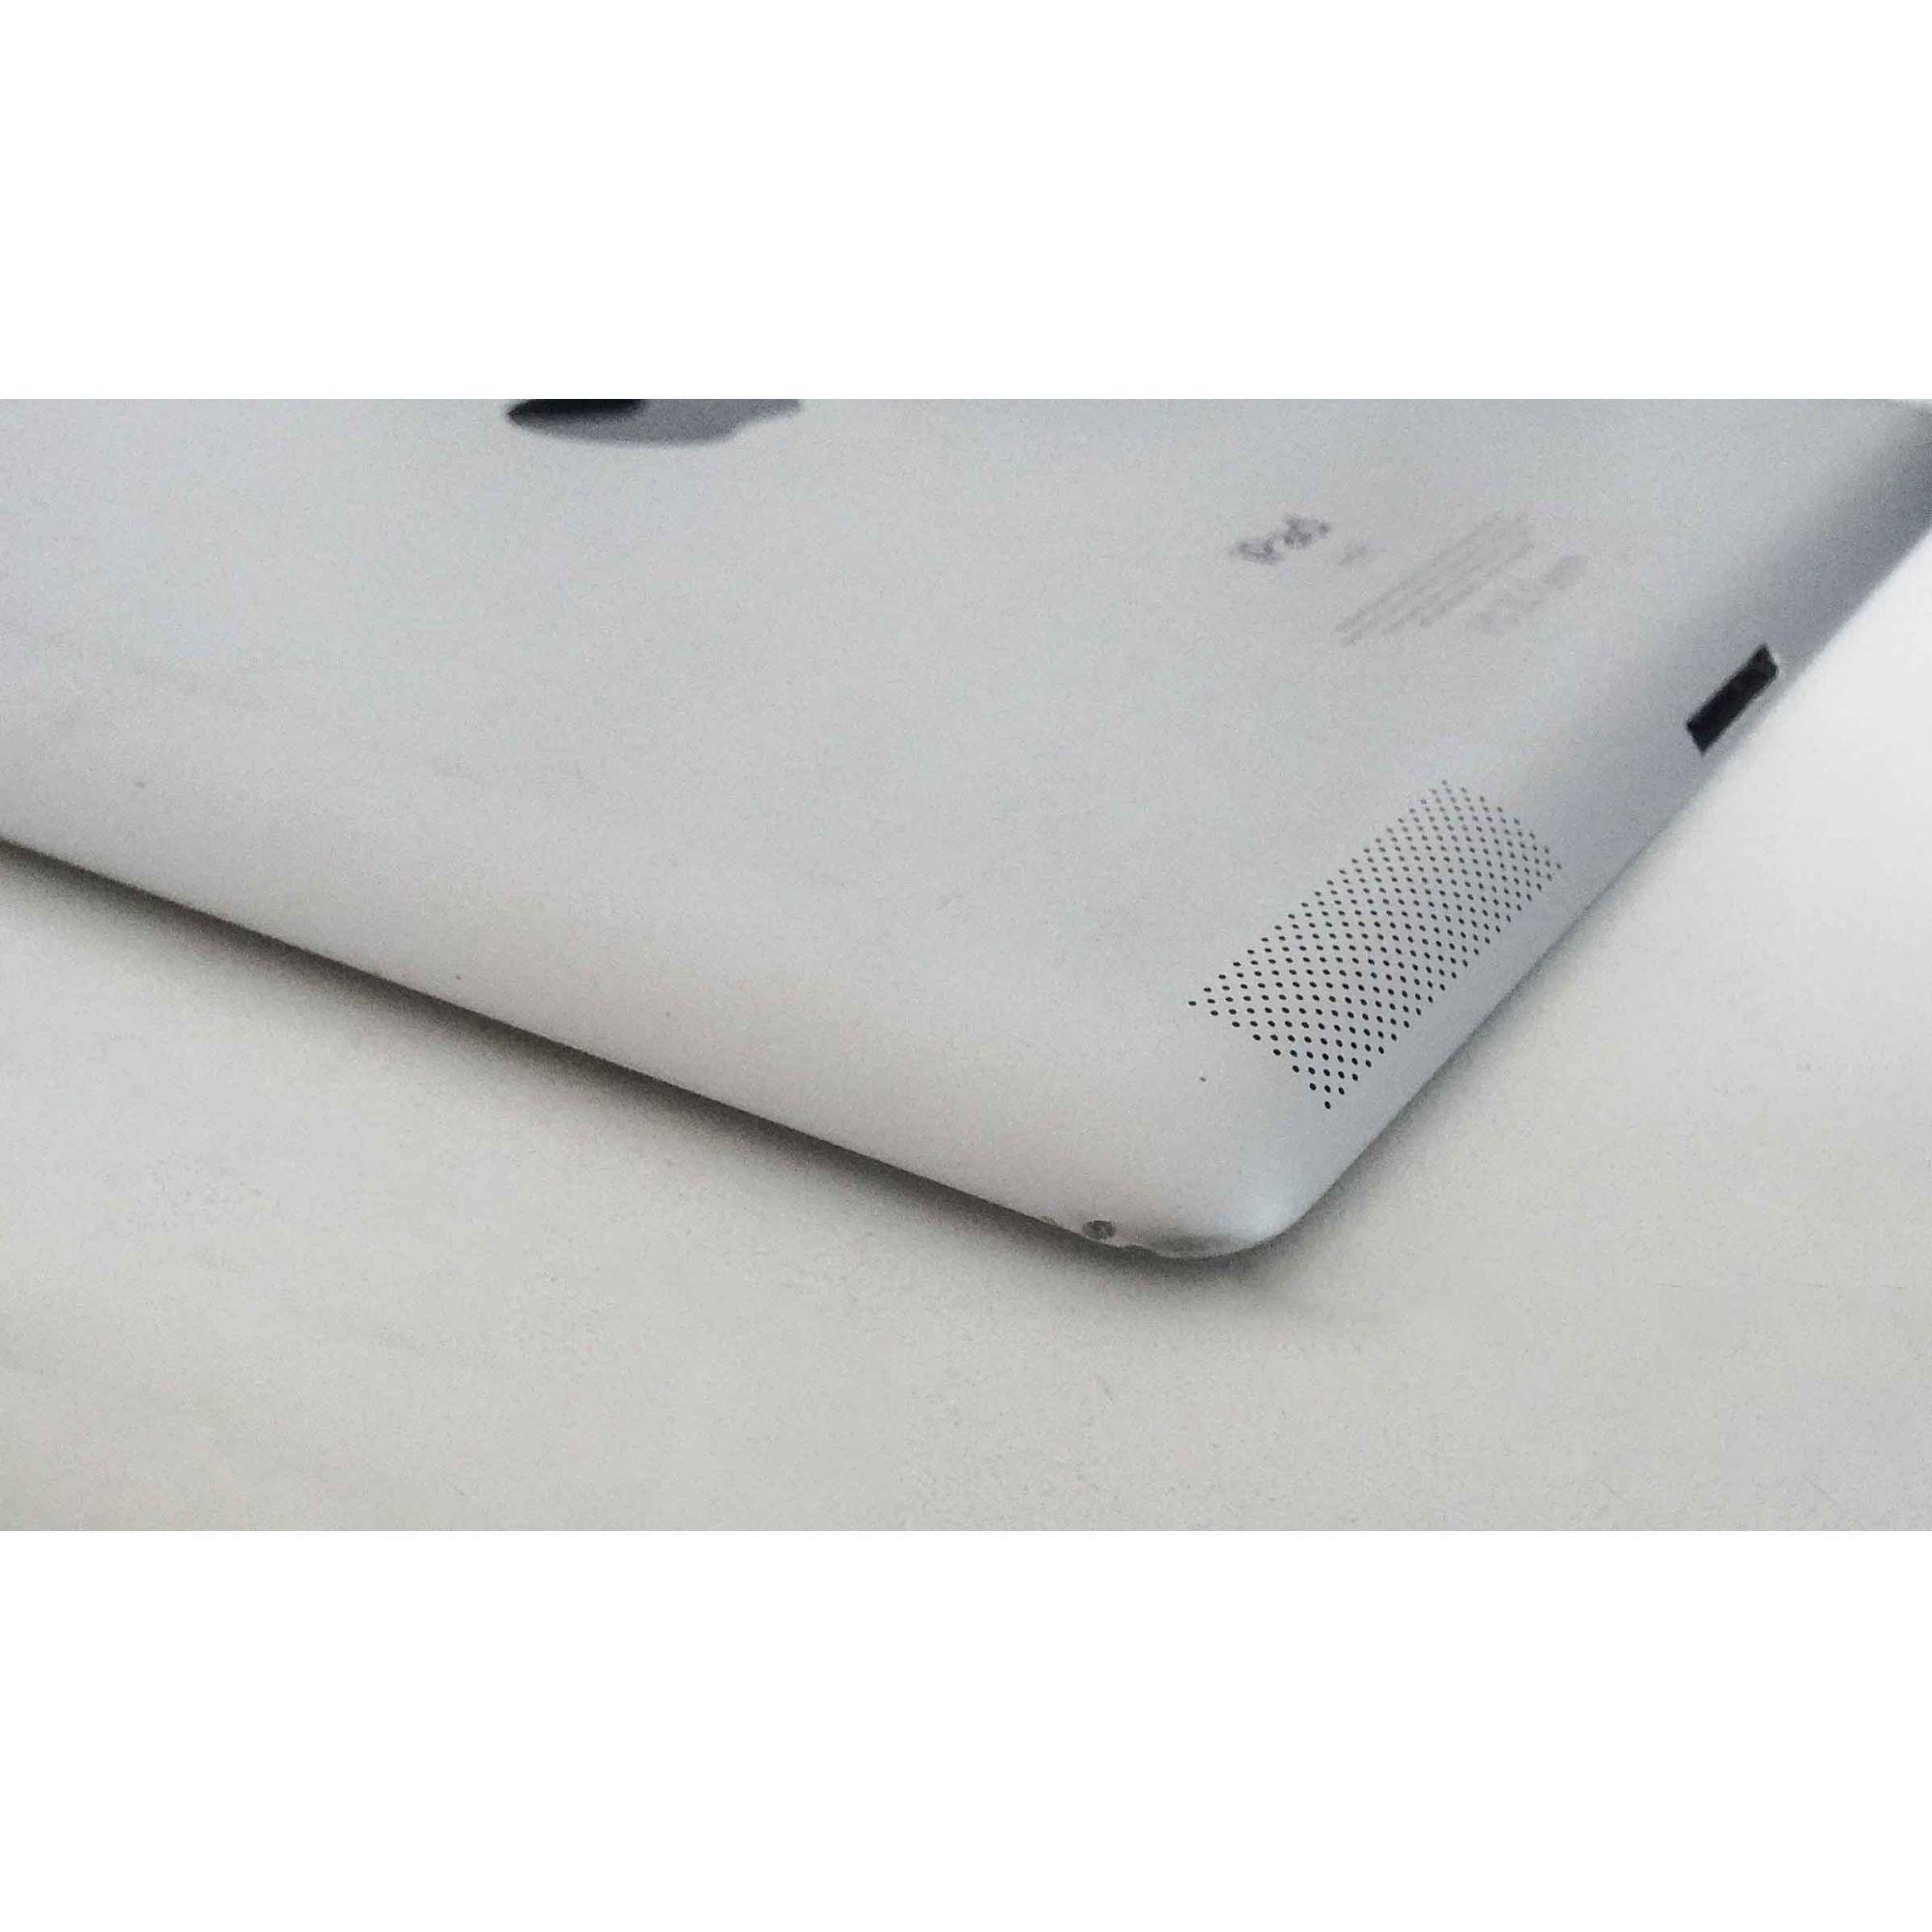 Ipad 2 MC984BZ/A 9.7'' Wifi/3G 64GB - Branco